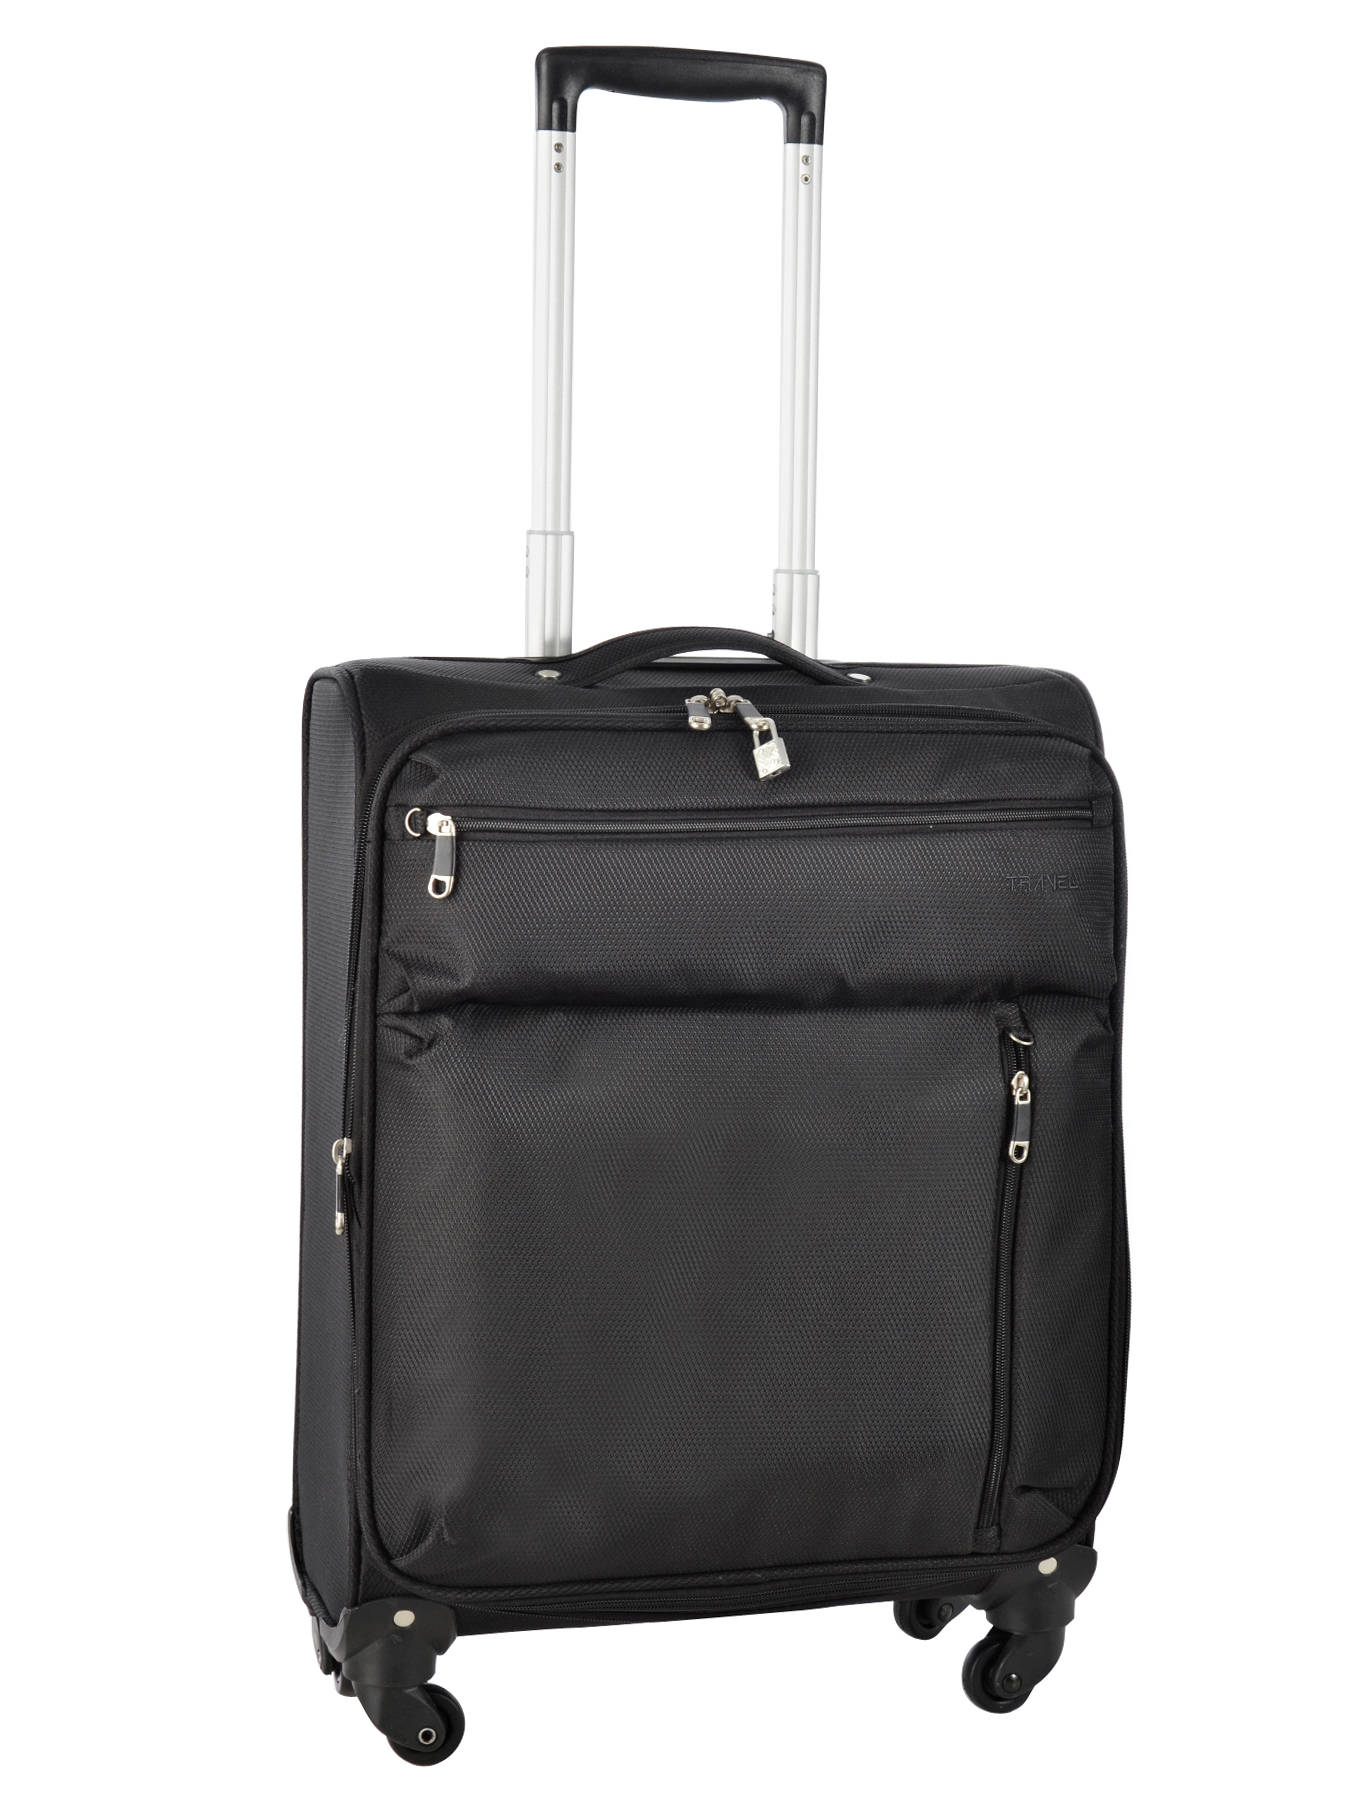 lot de valises travel travel 39 air travel 39 air en vente au. Black Bedroom Furniture Sets. Home Design Ideas